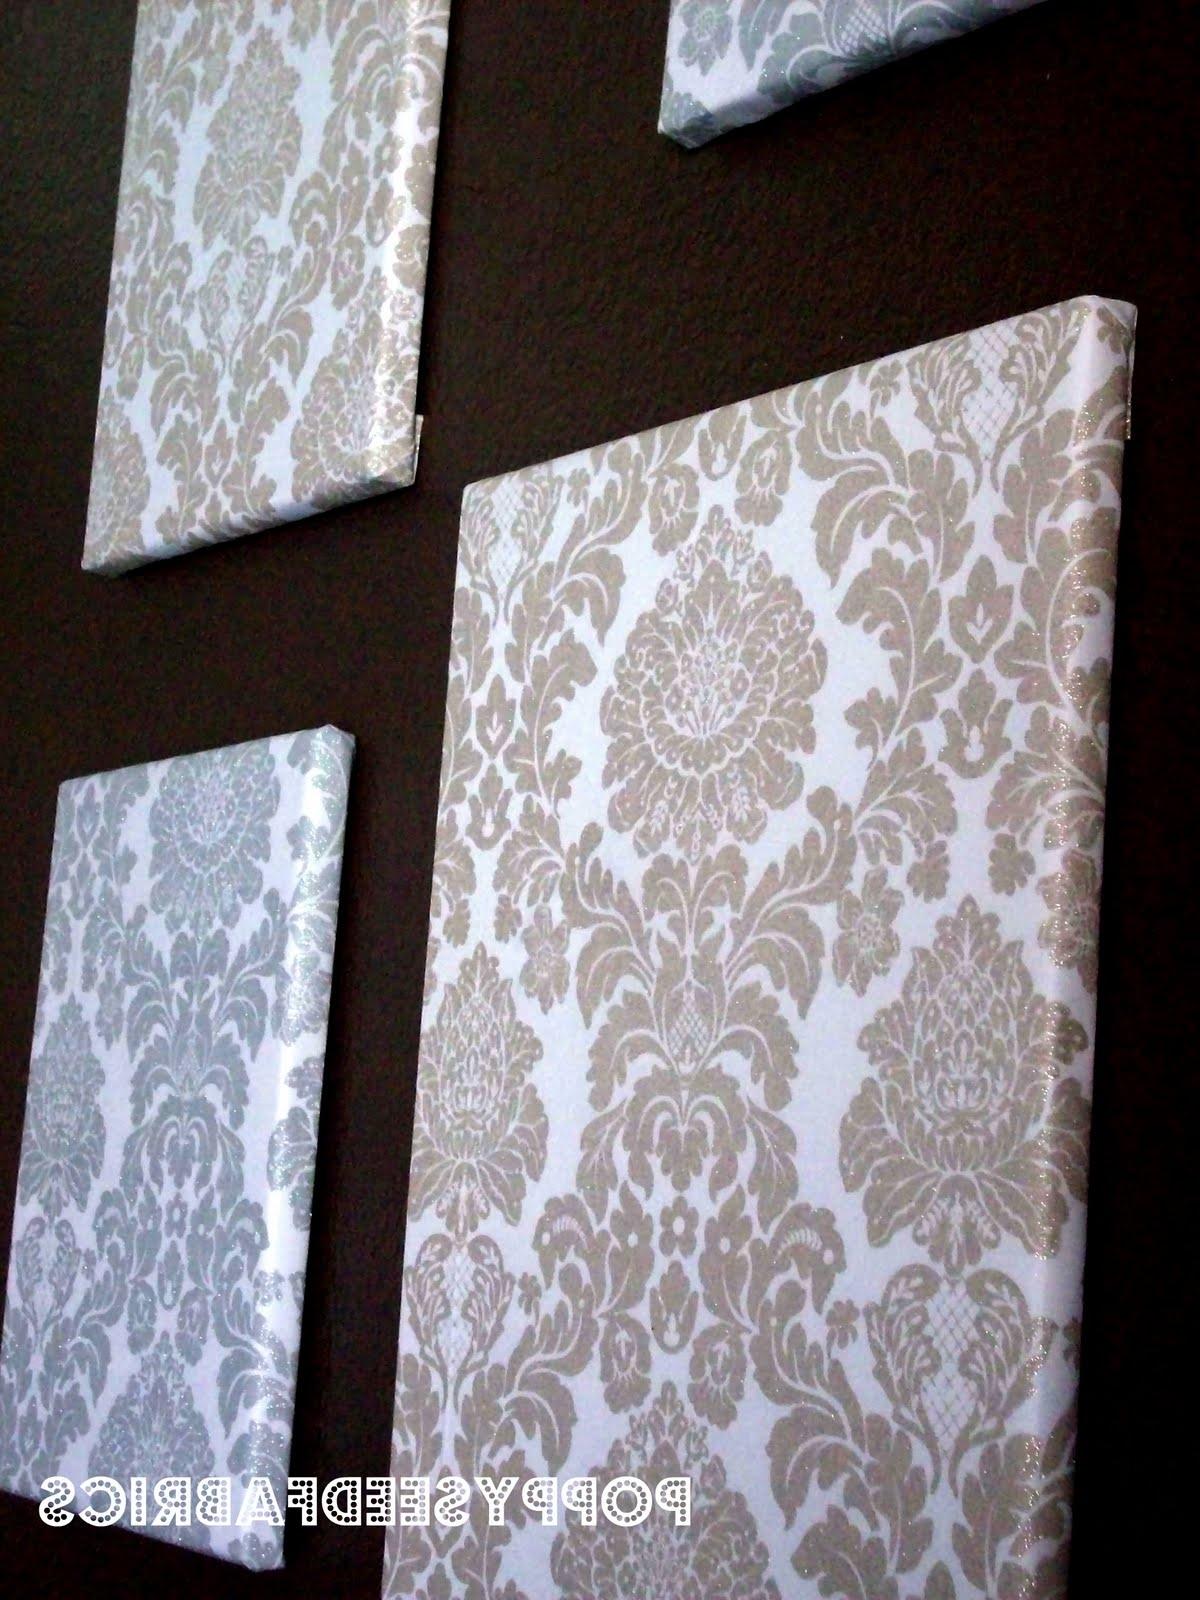 Cheap Fabric Wall Art Pertaining To Most Recent Poppyseed Fabrics: Fabric Wall Art Tutorial (View 10 of 15)